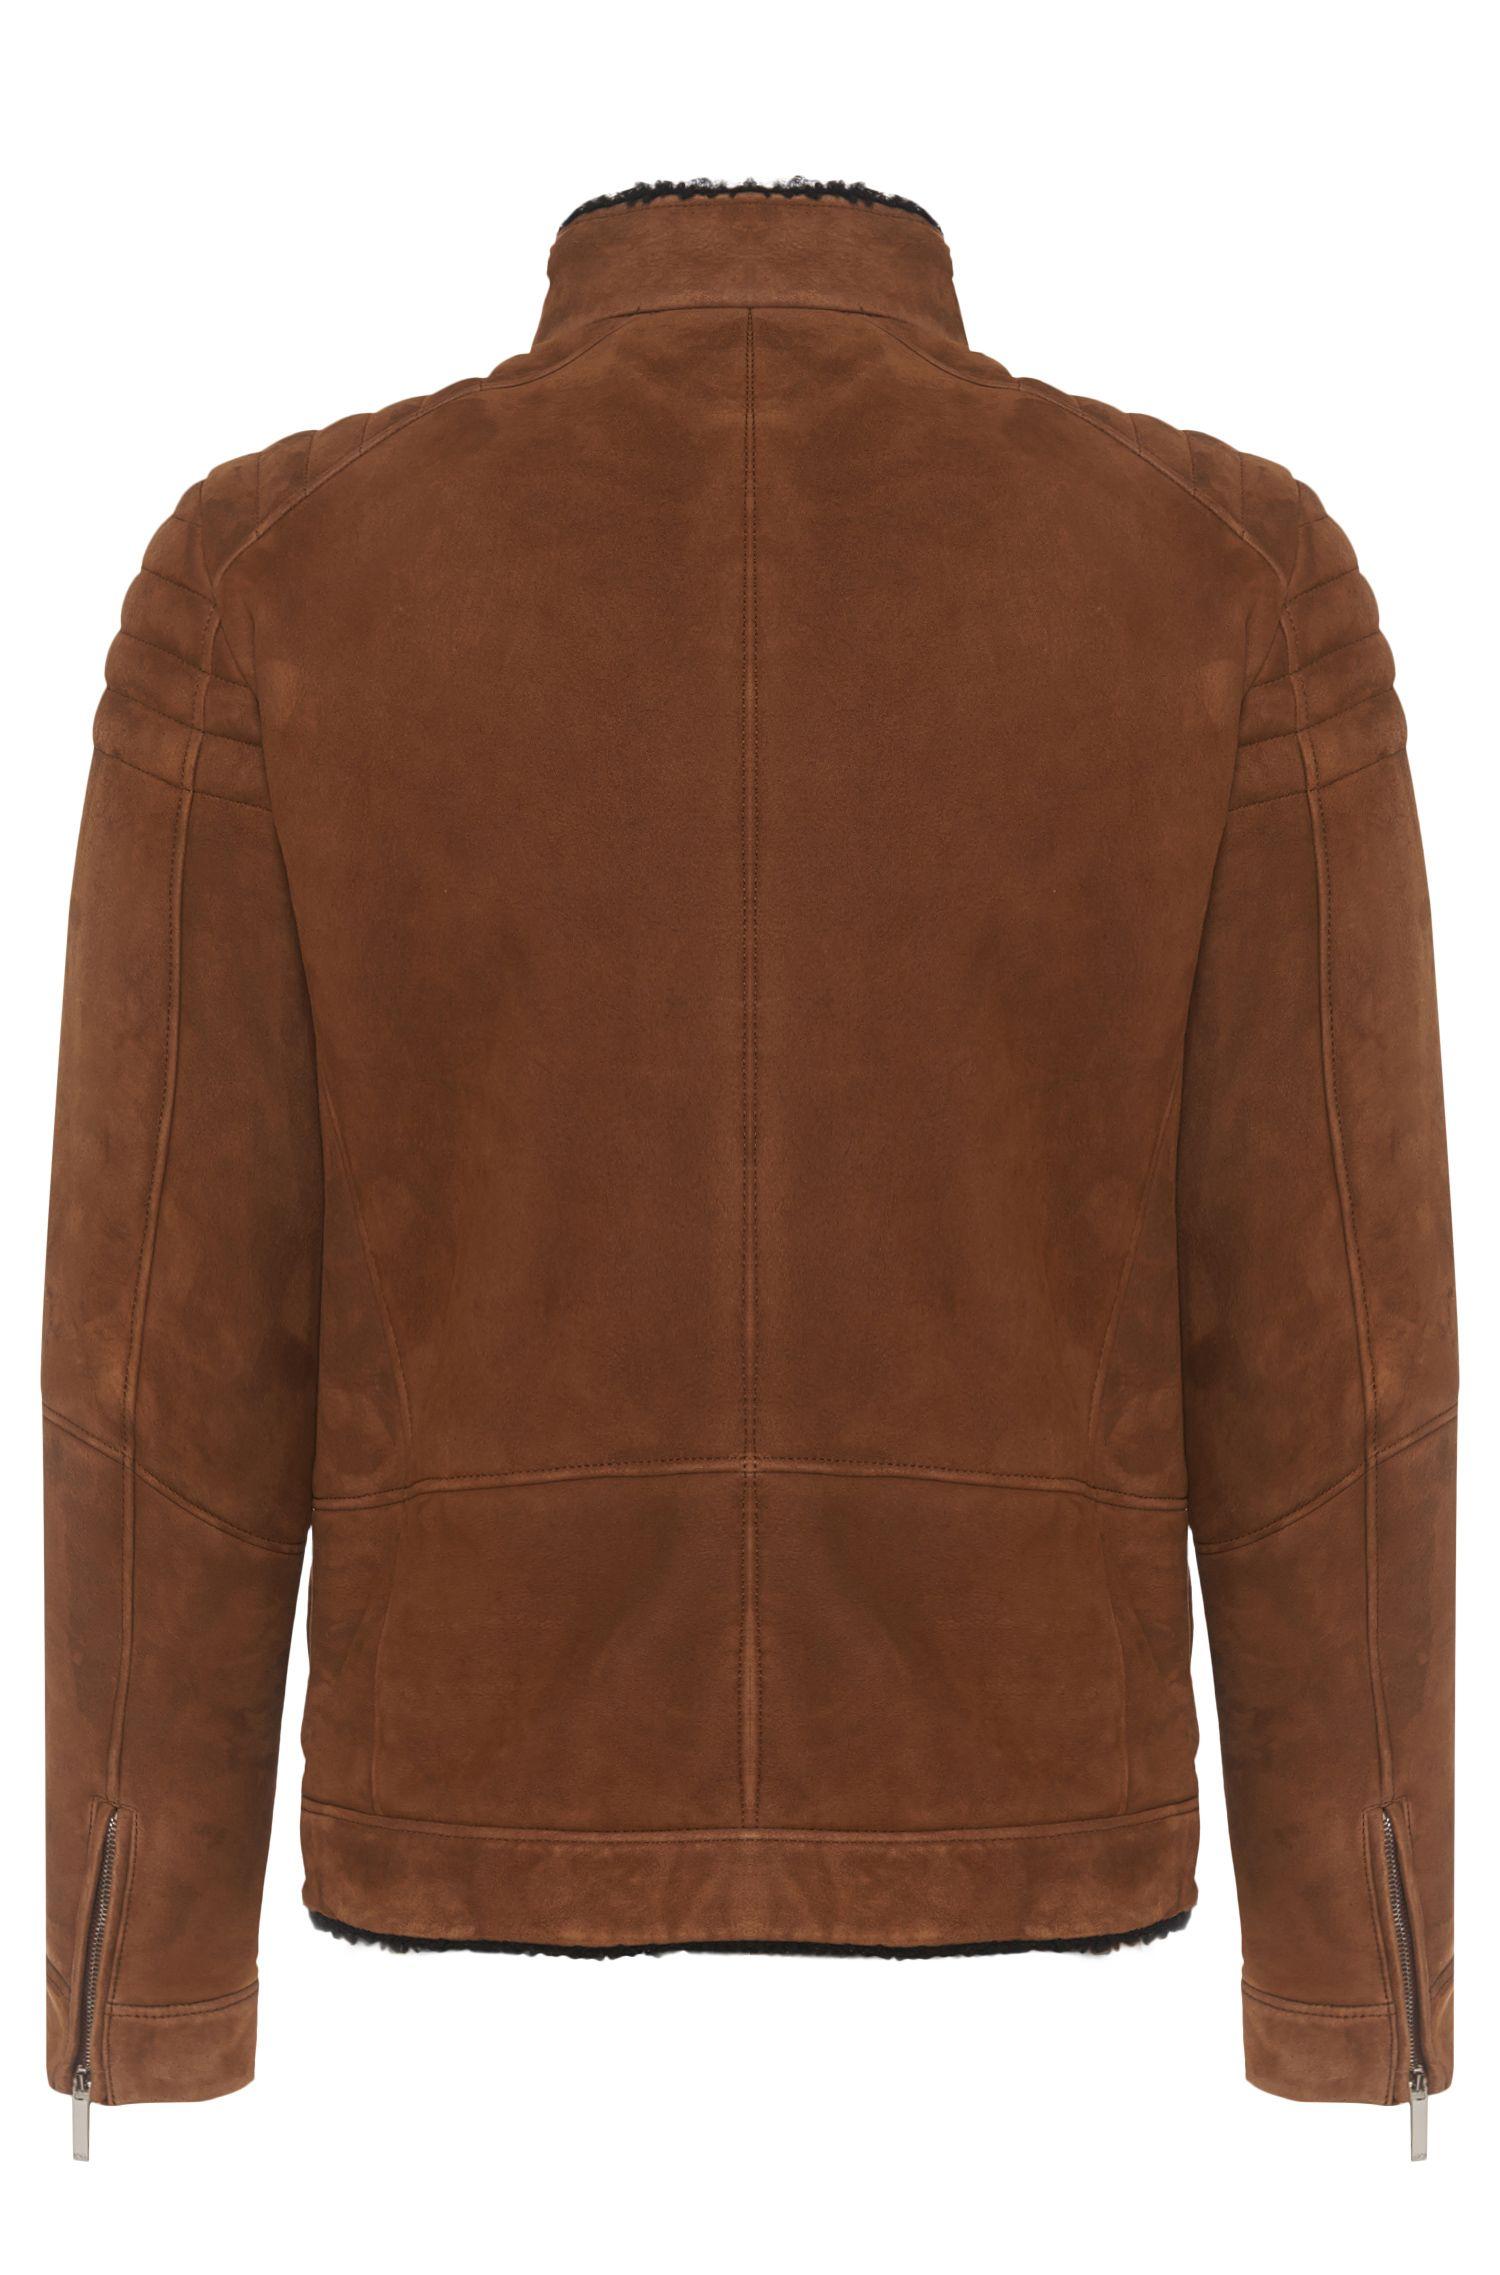 Regular-Fit Tailored Lederjacke mit Lammfell-Futter und Zippern: 'T-Corsino'